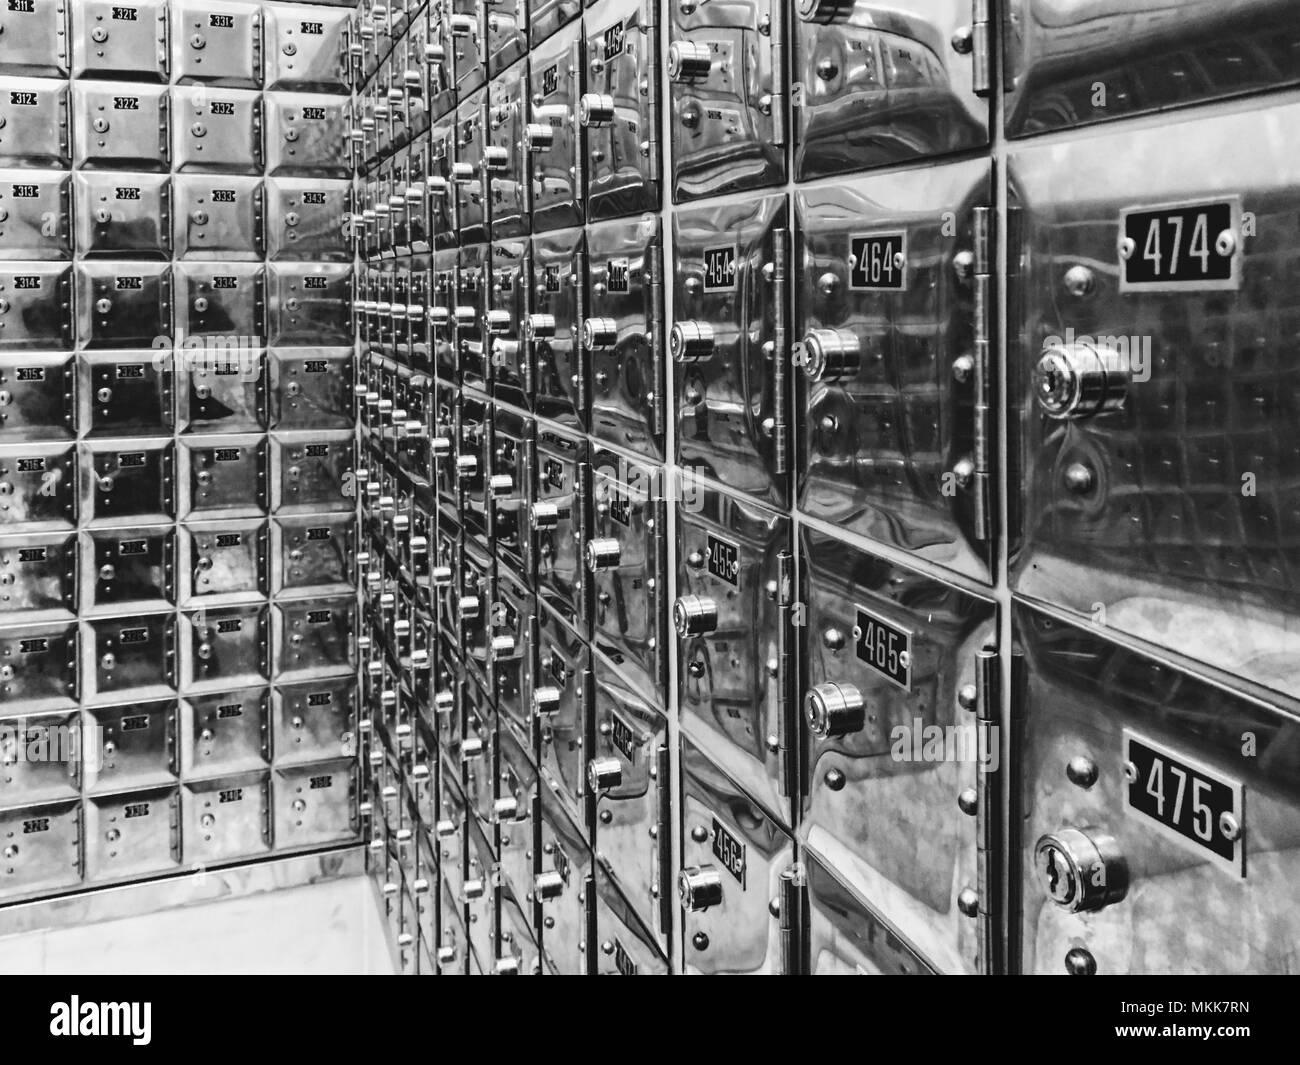 Storage of metallic numbered boxes - Stock Image